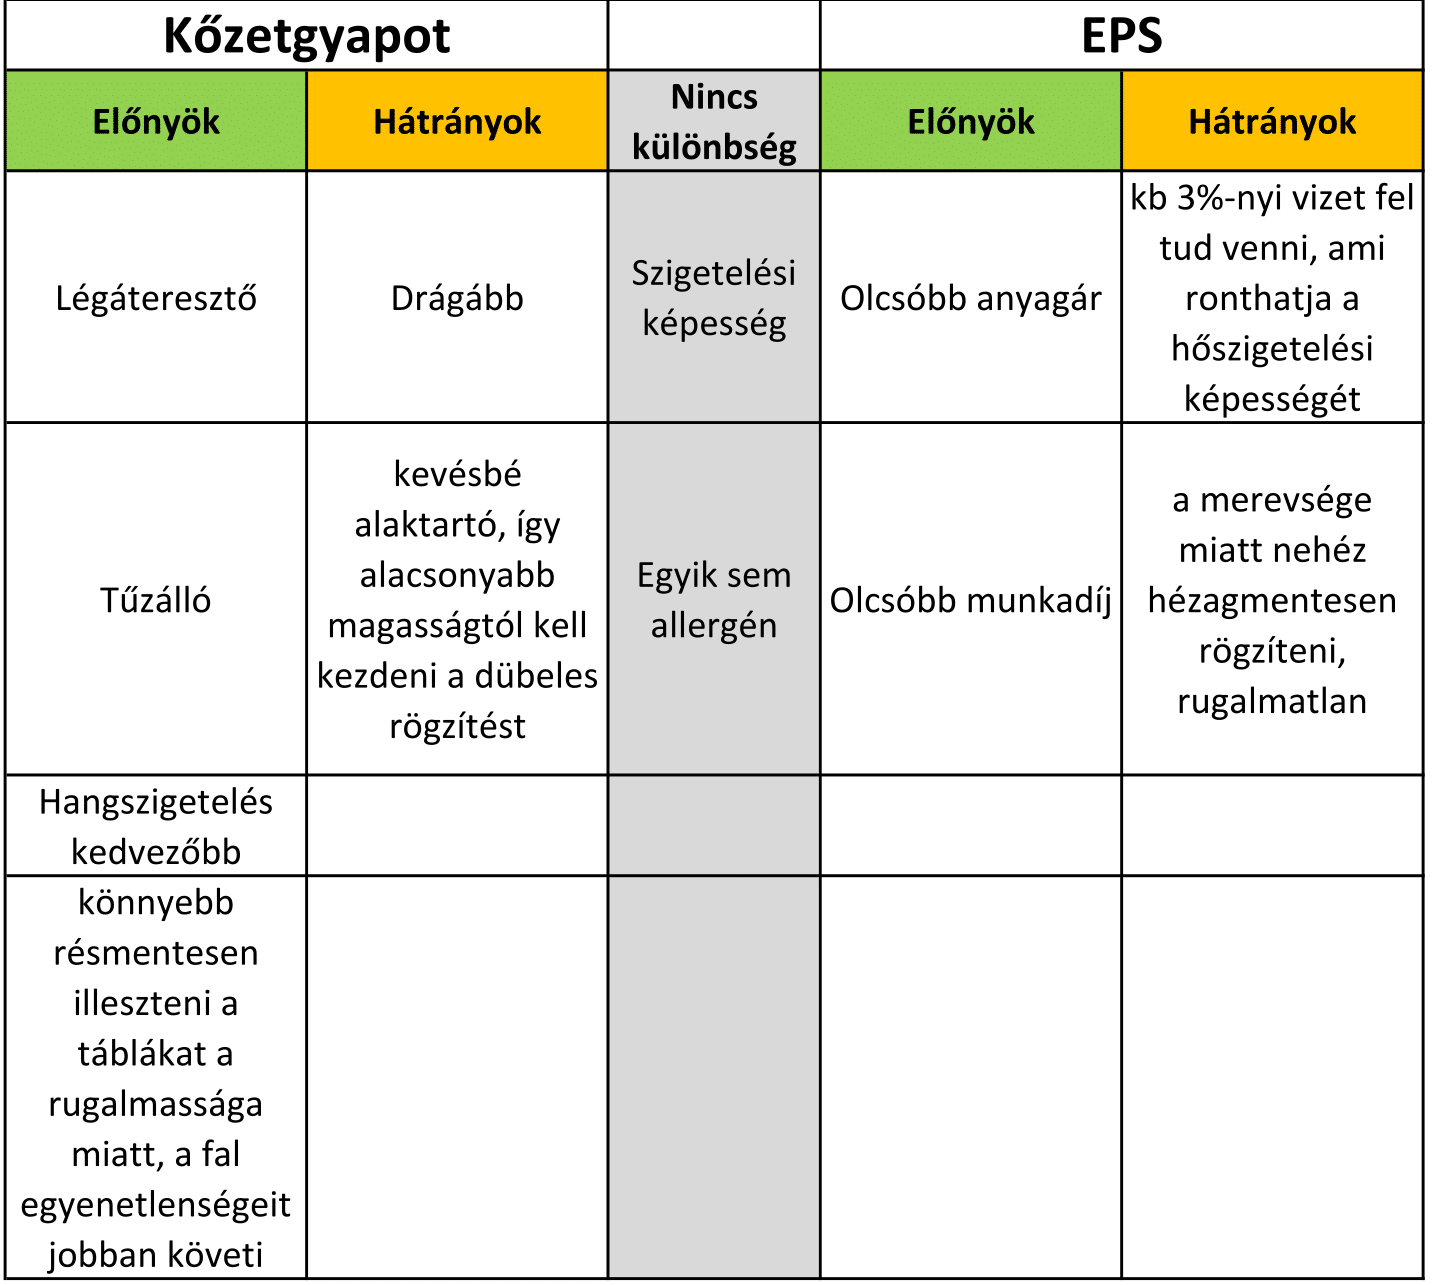 eps_vs_gyapot-1_1.png